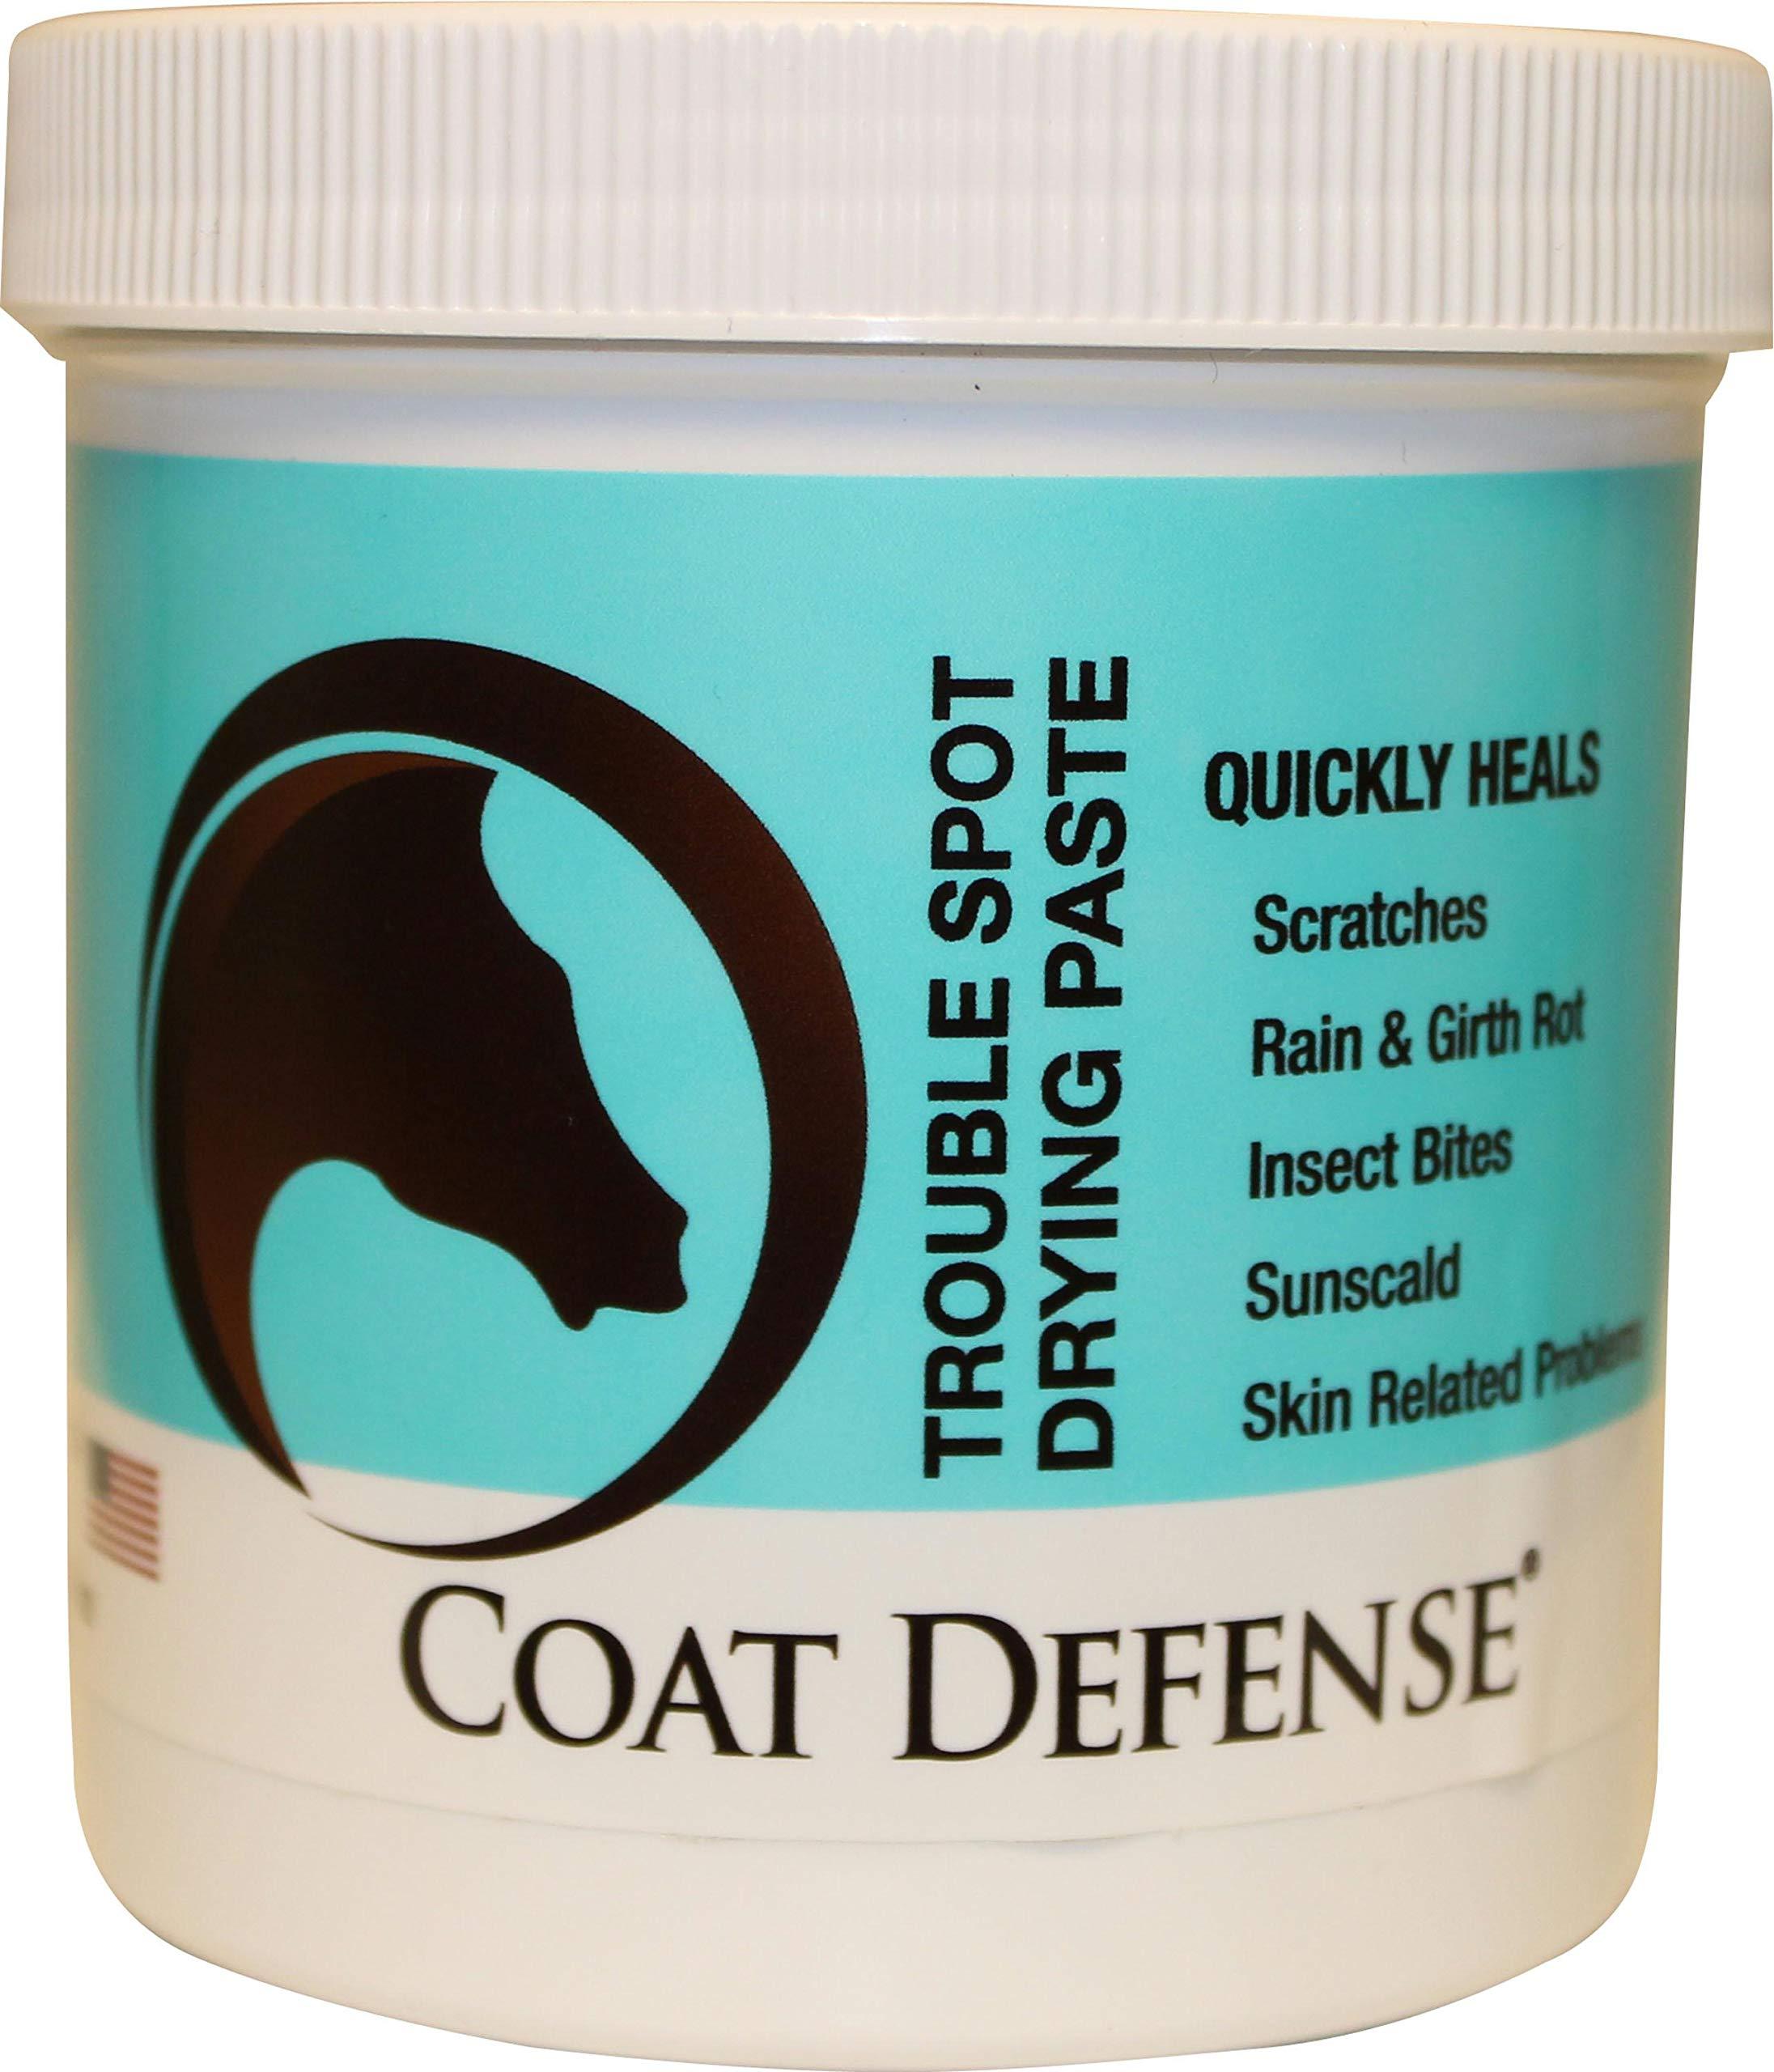 Coat Defense 793597086501 Trouble Spot Drying Paste, 24 oz by COAT DEFENSE